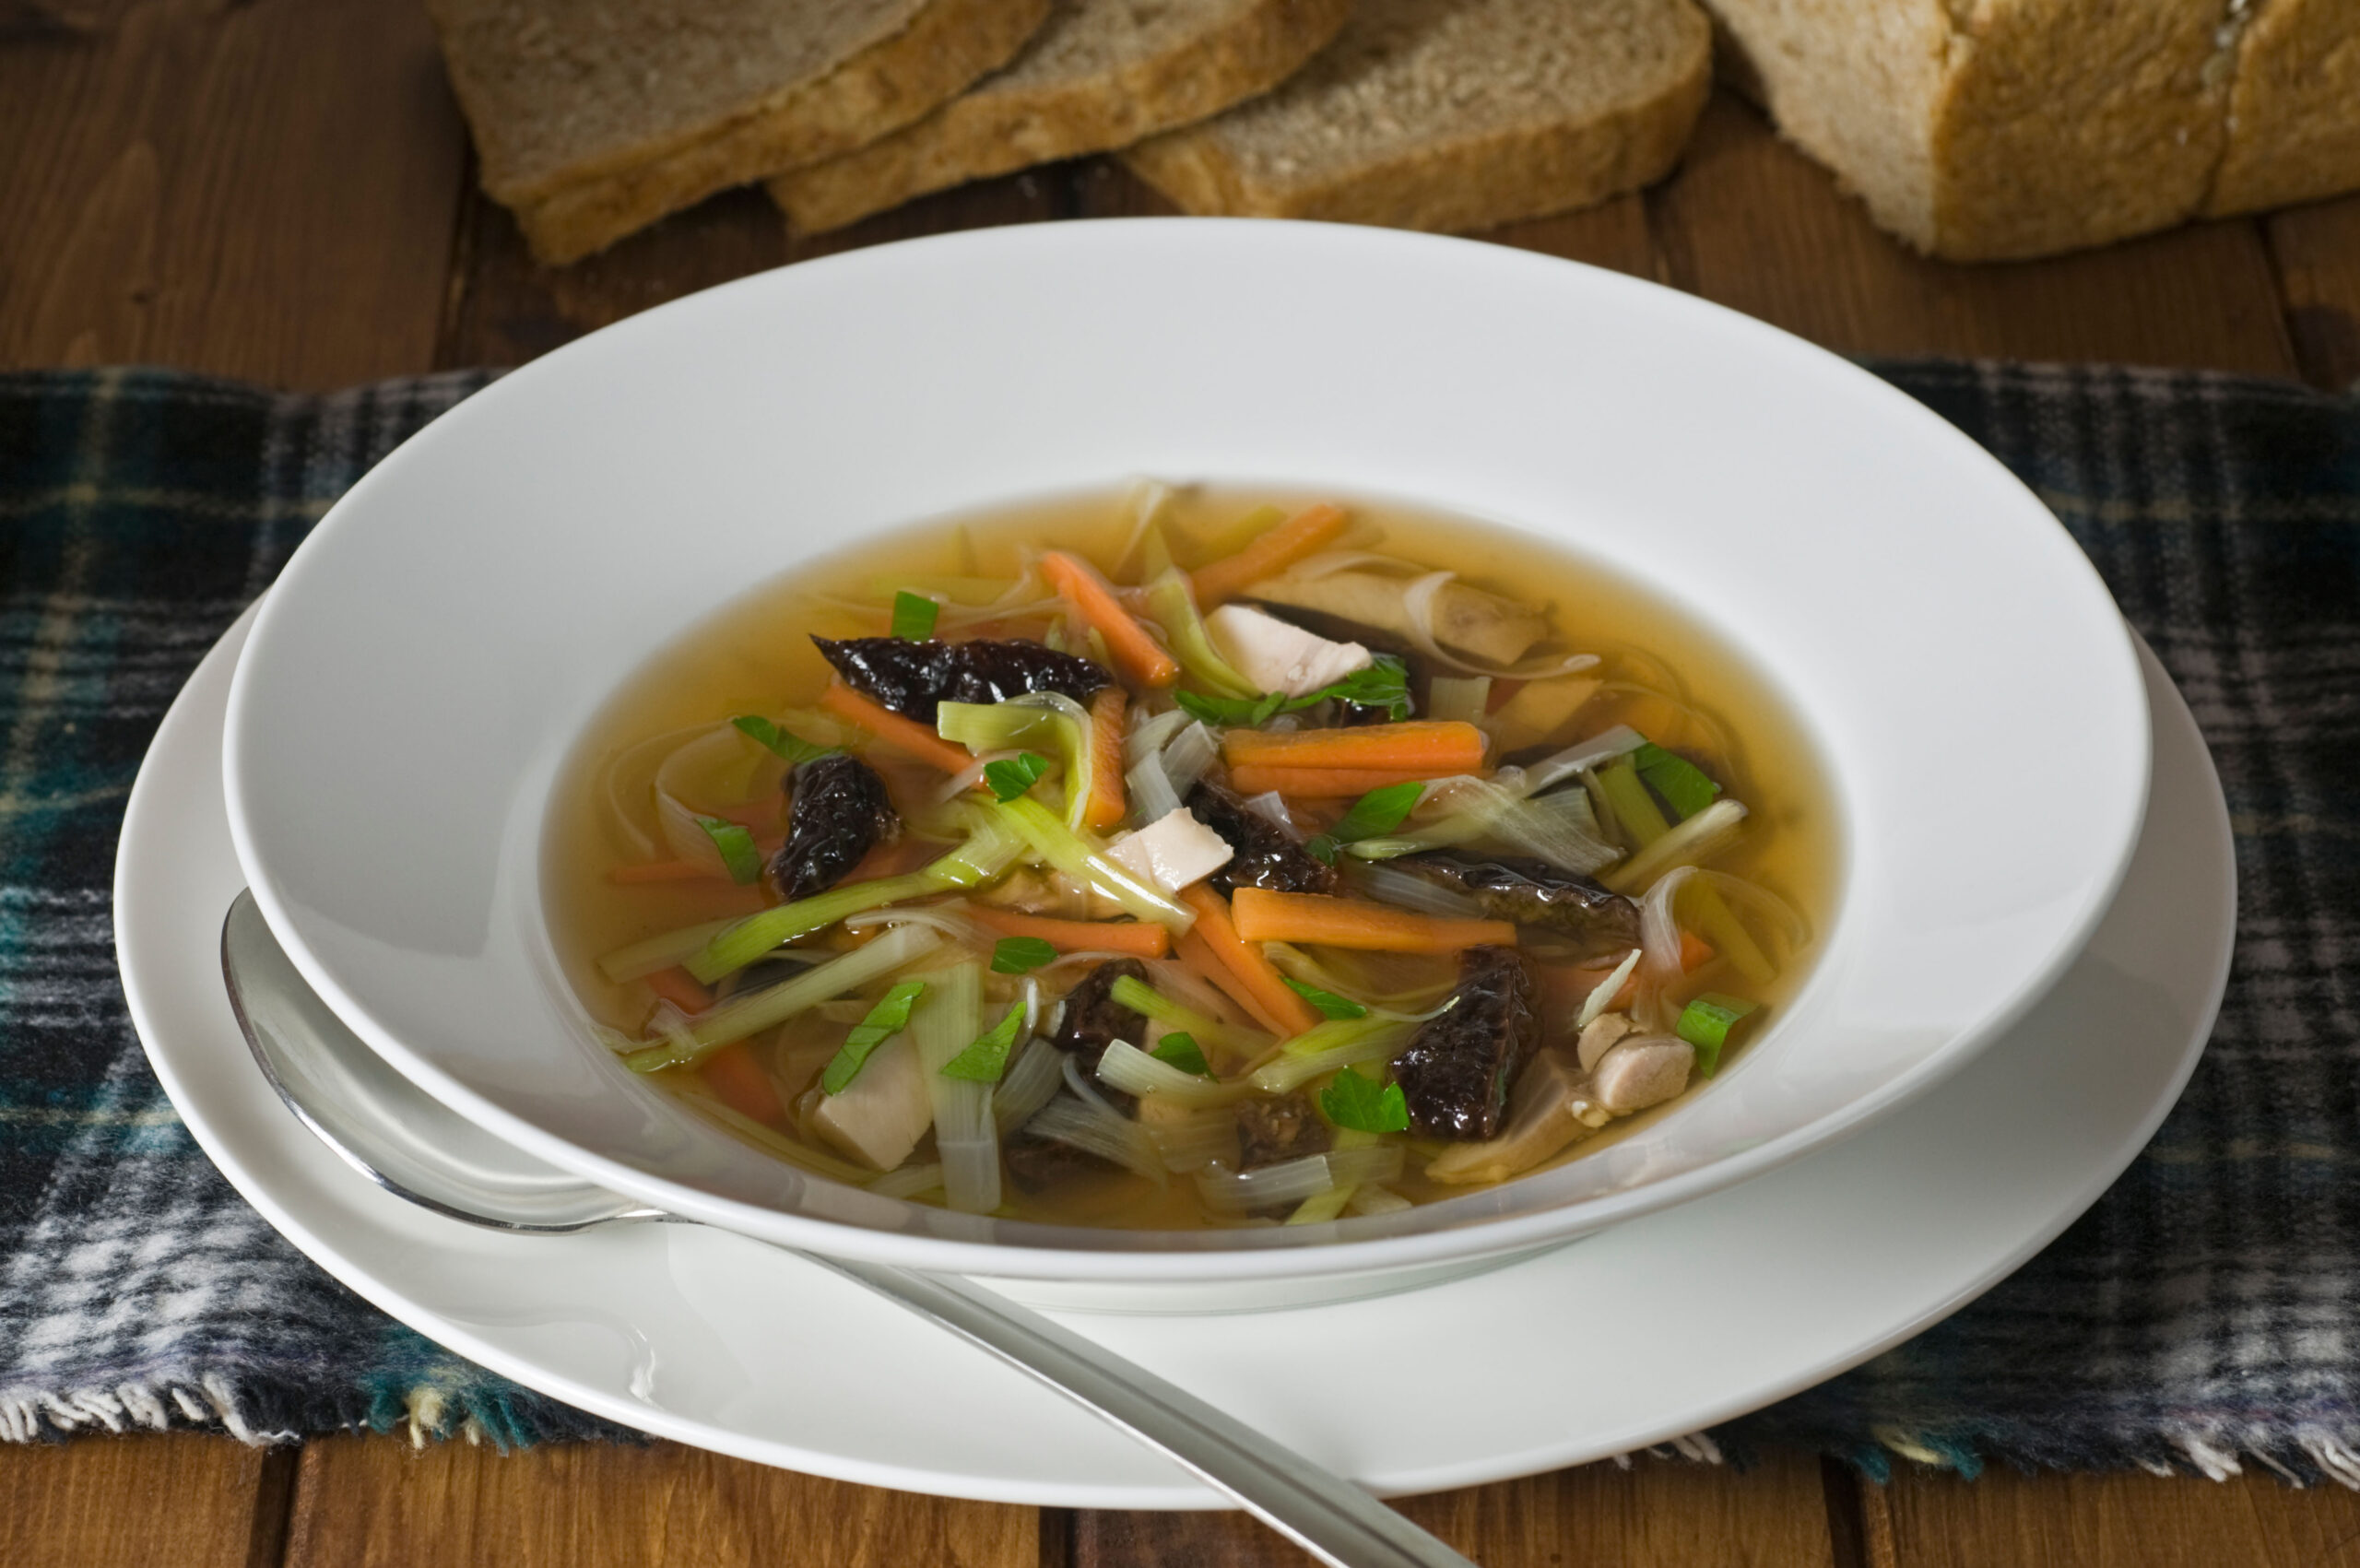 Cock a leekie soup